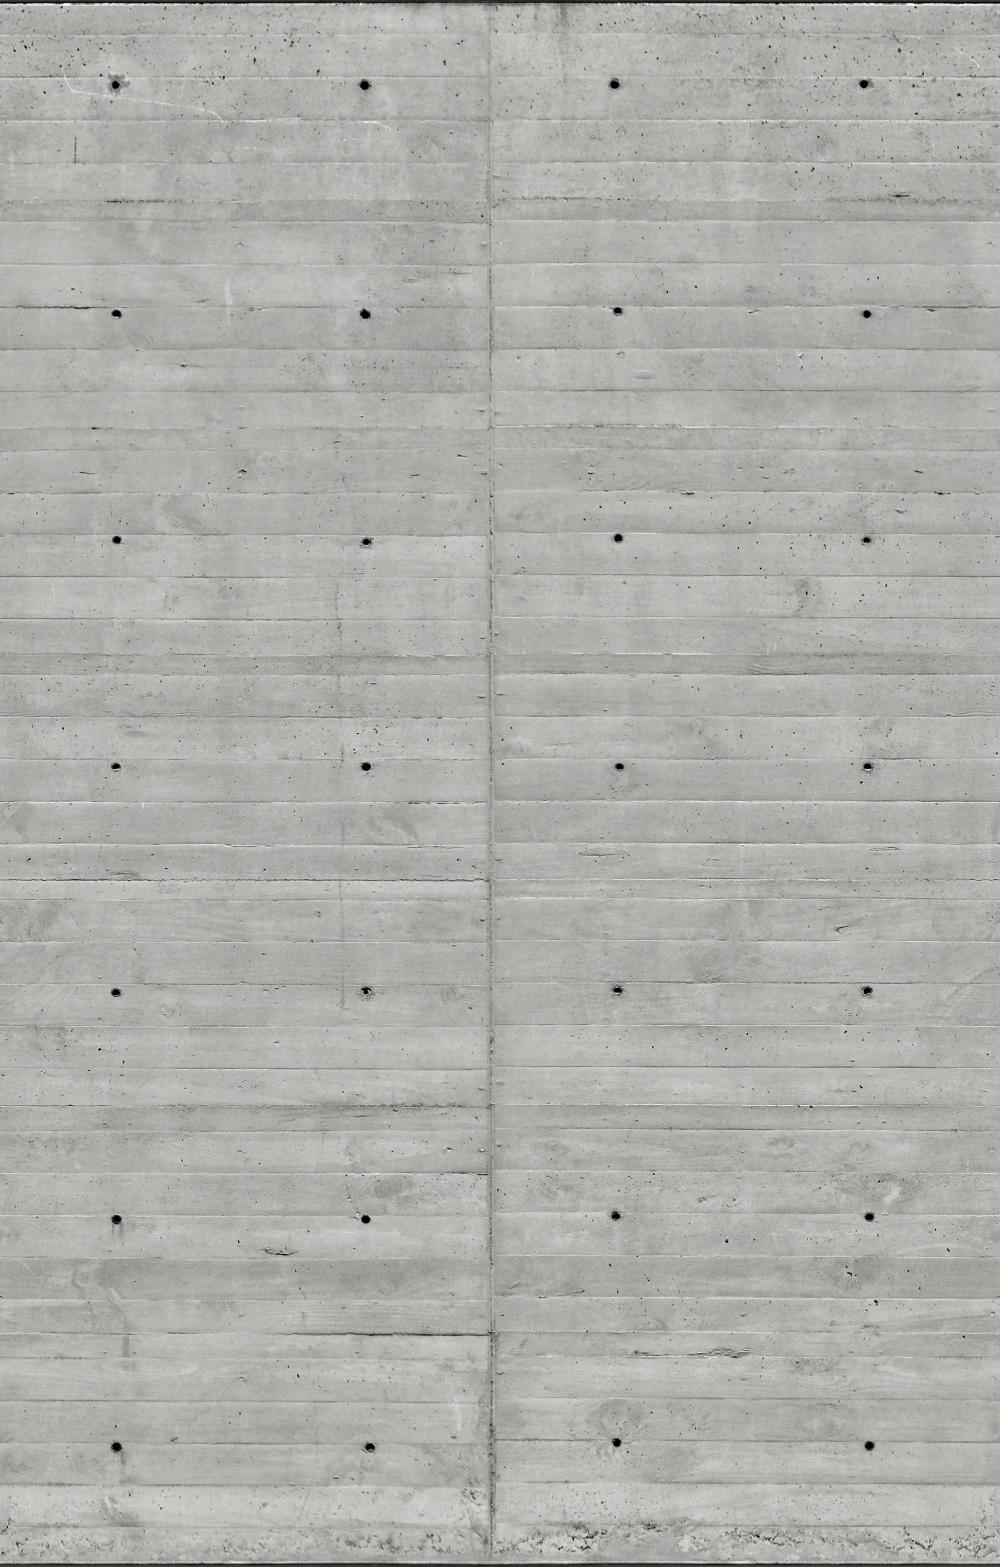 Boardmarked Concrete Gijon Architextures In 2020 Texture Concrete Texture Seamless Textures